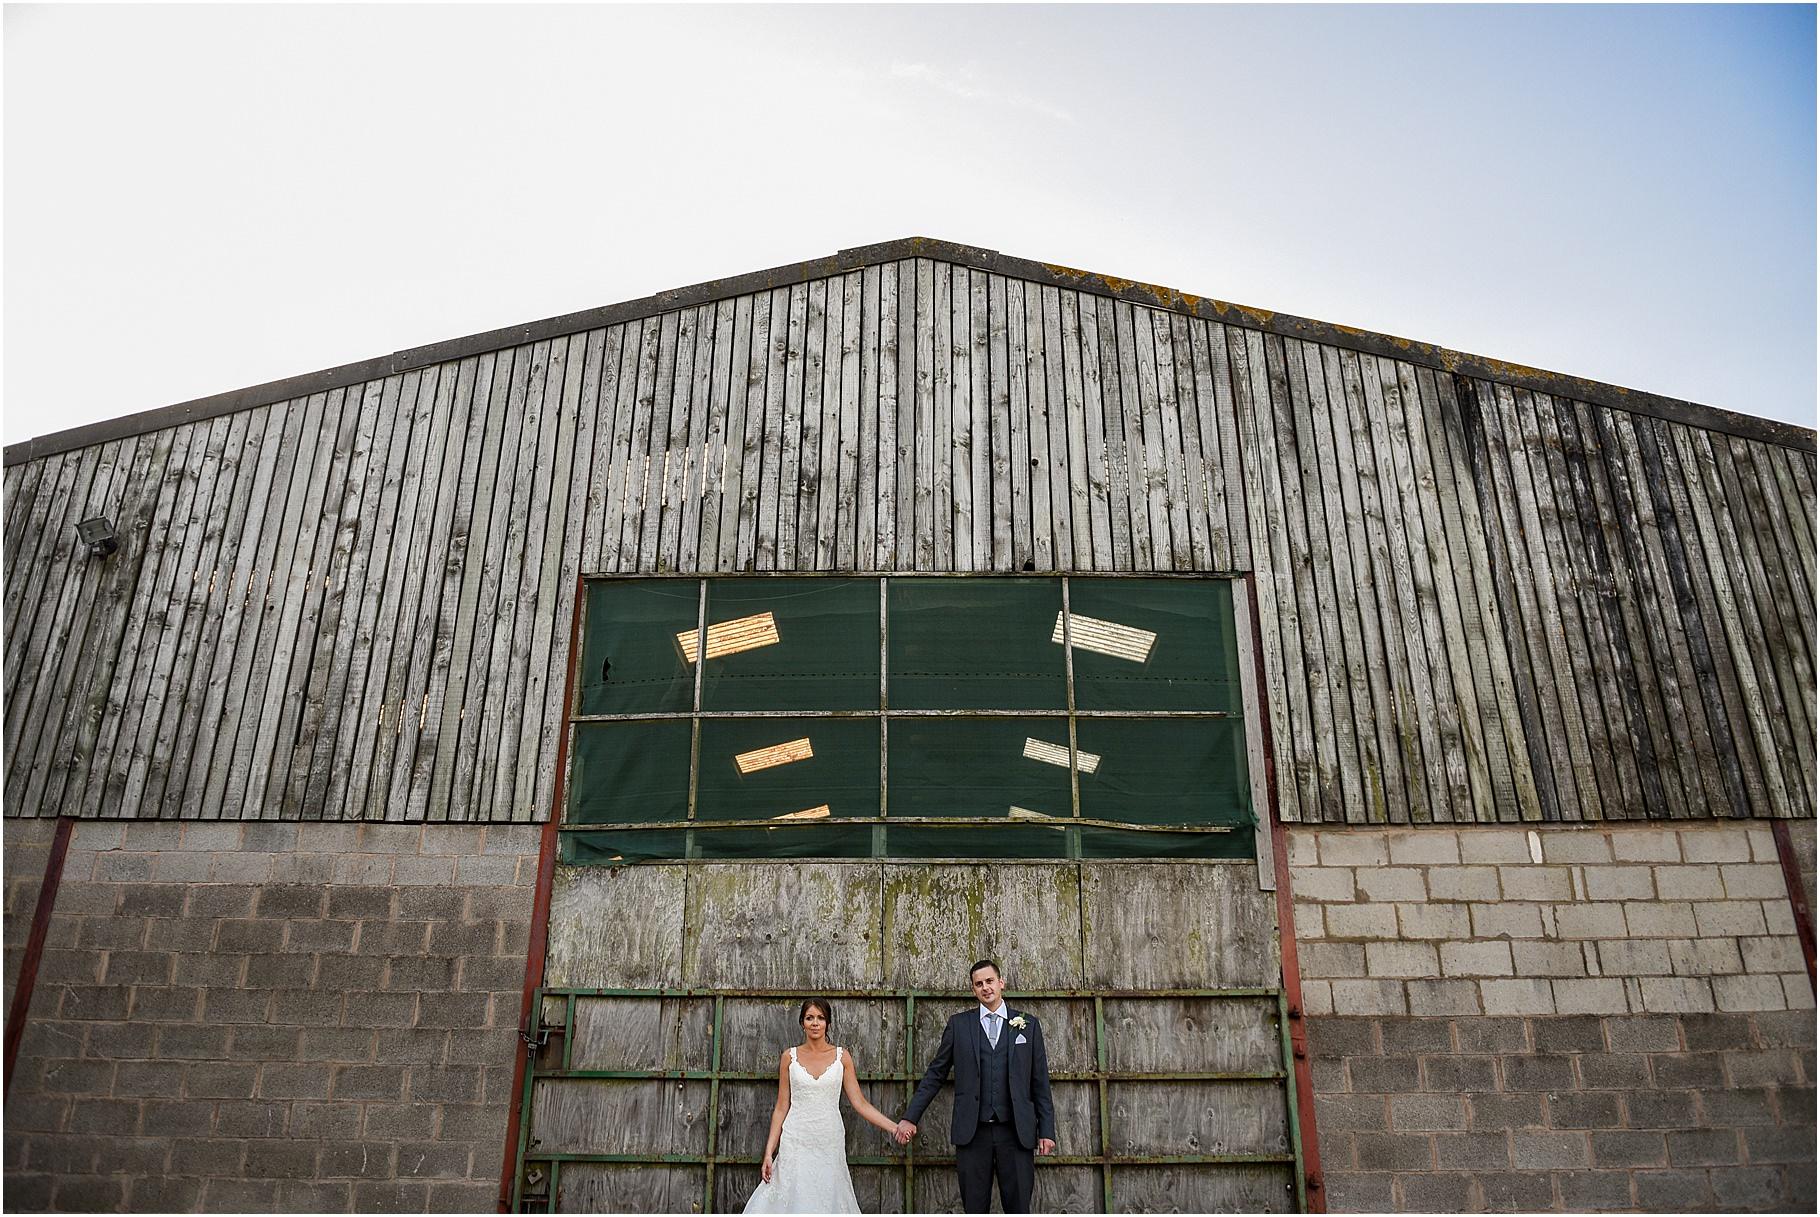 the-villa-wrea-green-wedding-photographer-66.jpg